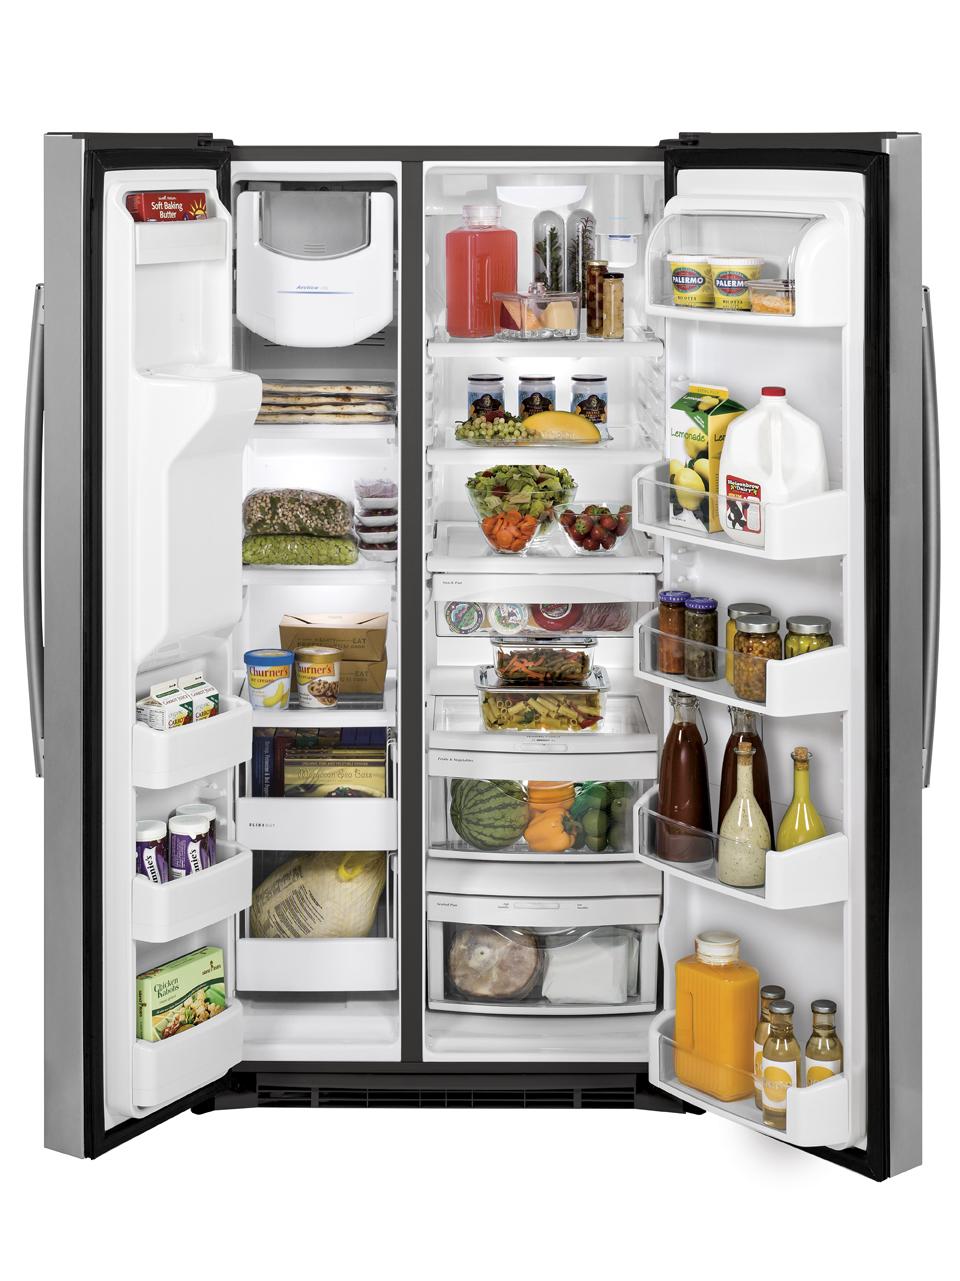 GE Appliances at Best Buy